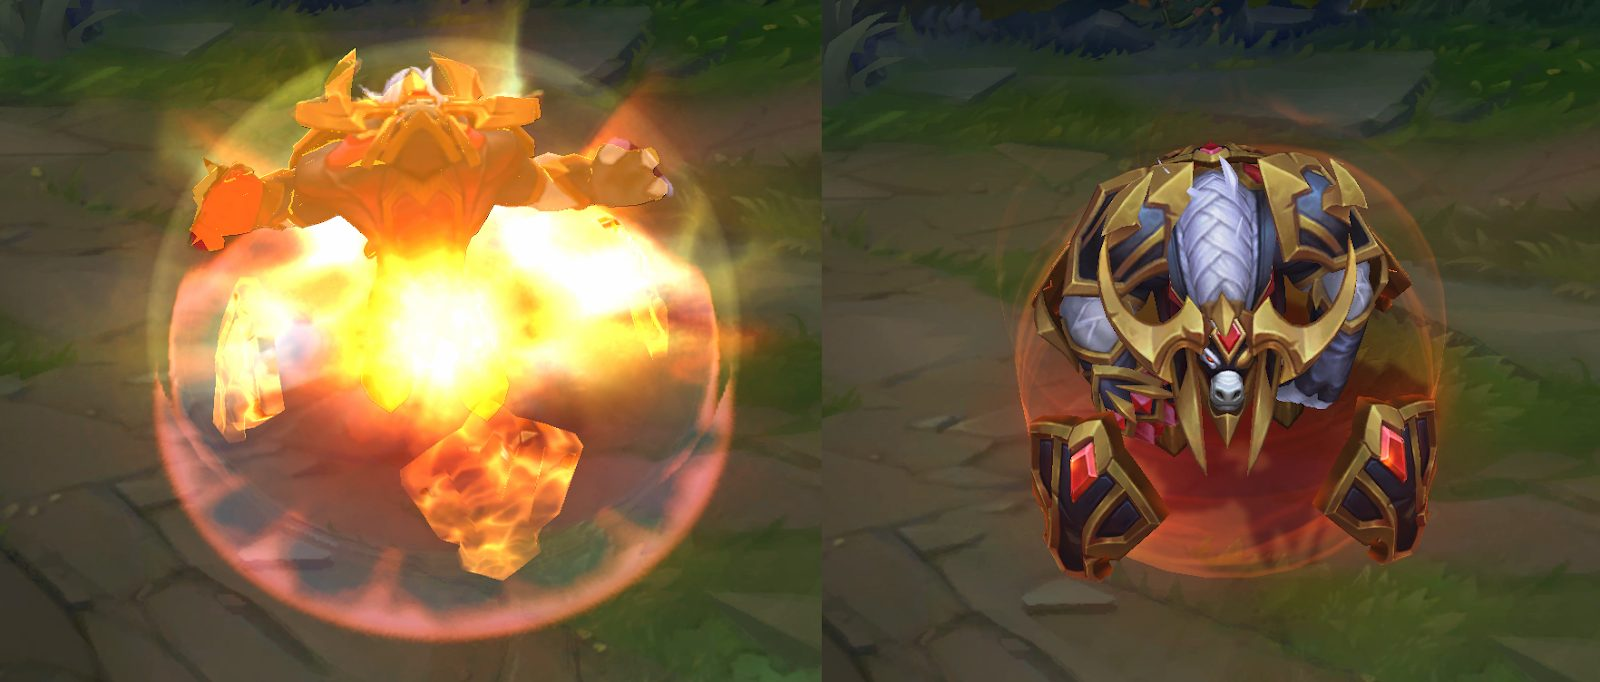 conqueror alistar skin spell animation